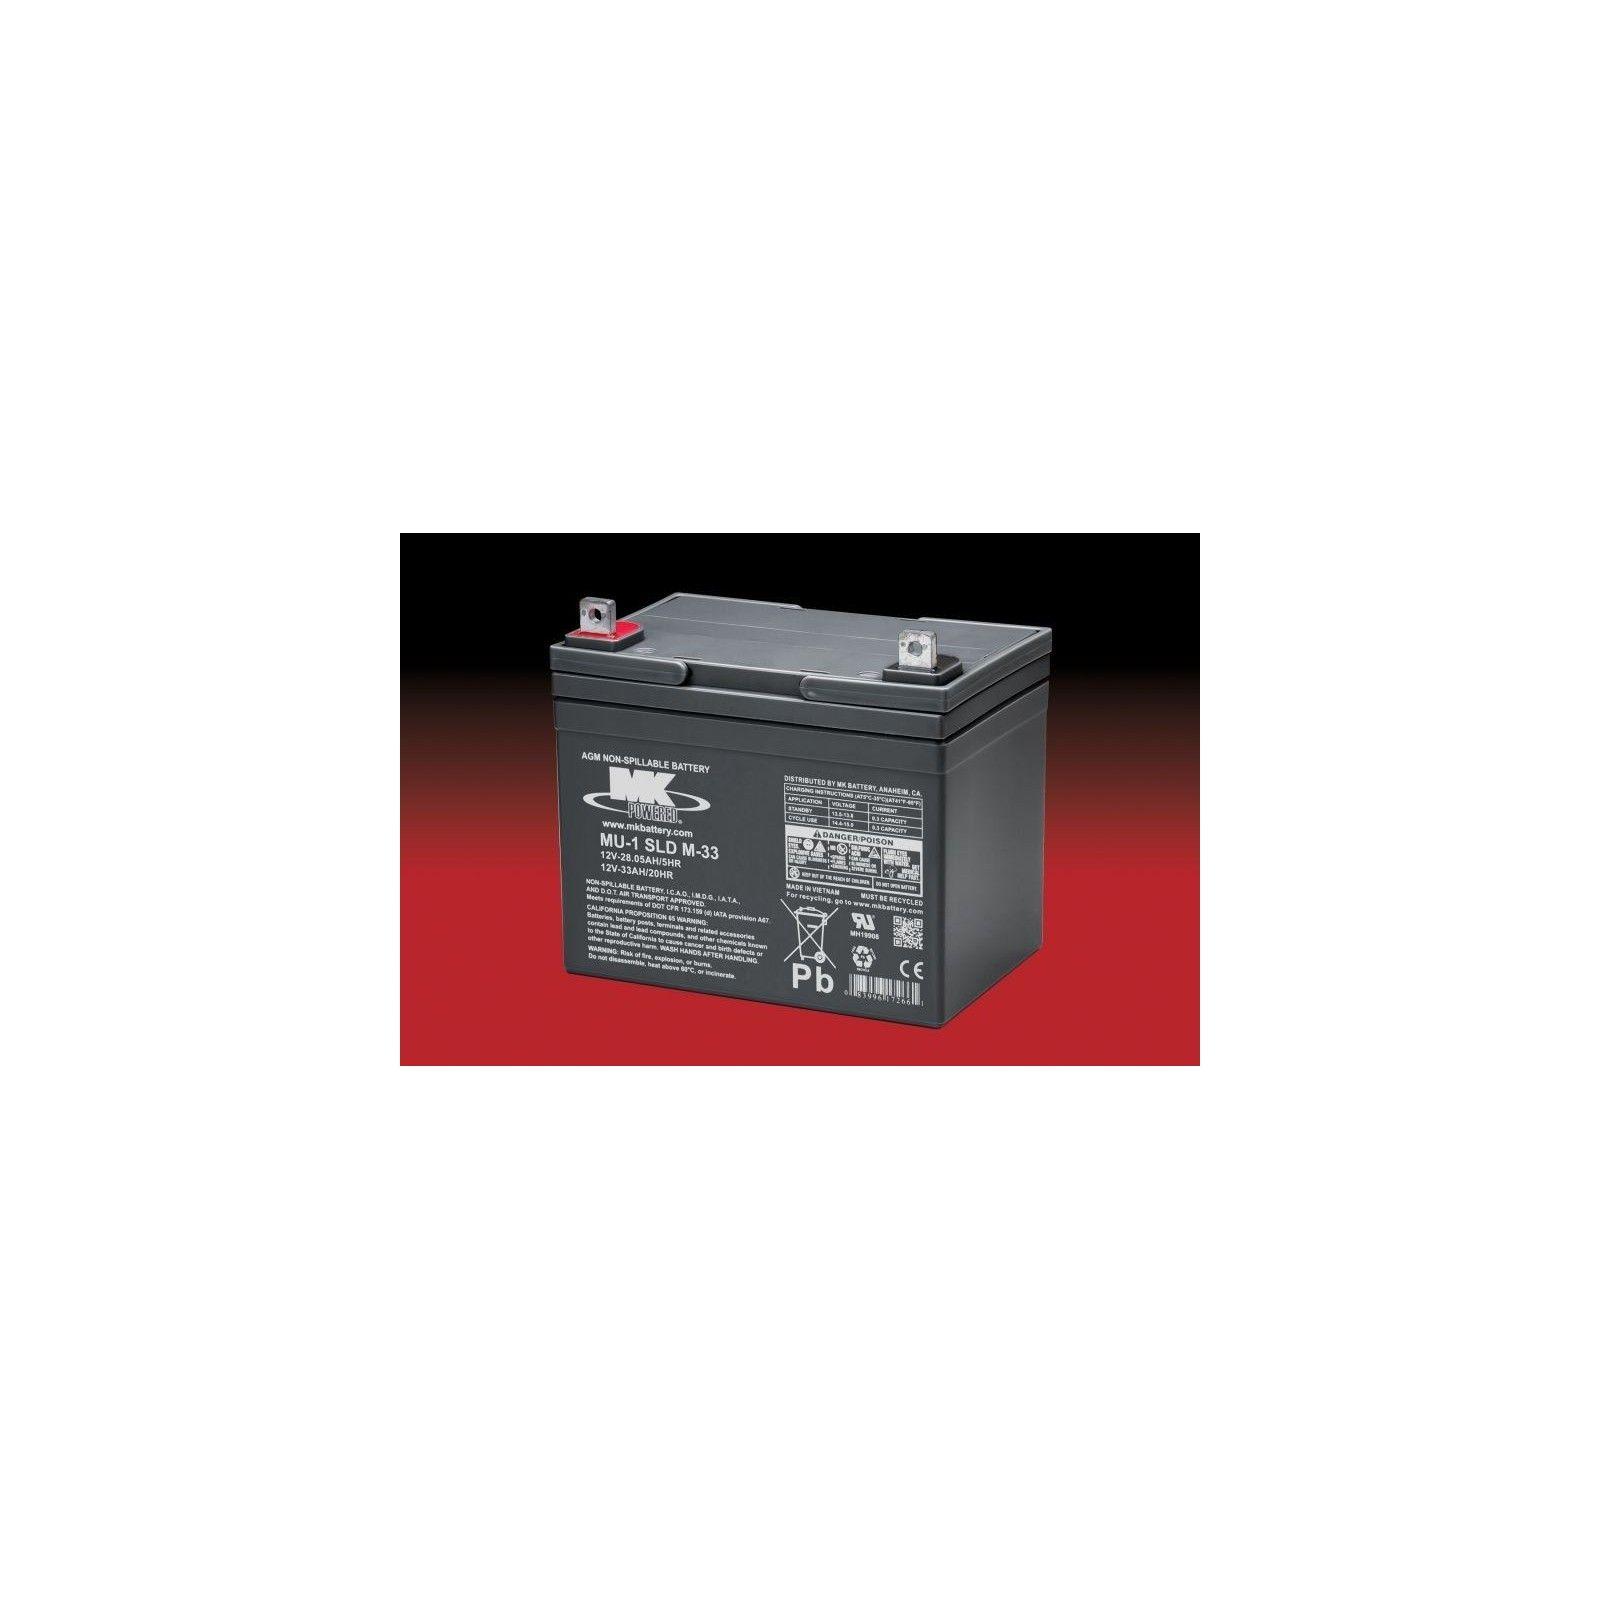 Batería MK MU-1 SLD M-33 33Ah 12V Agm MK - 1